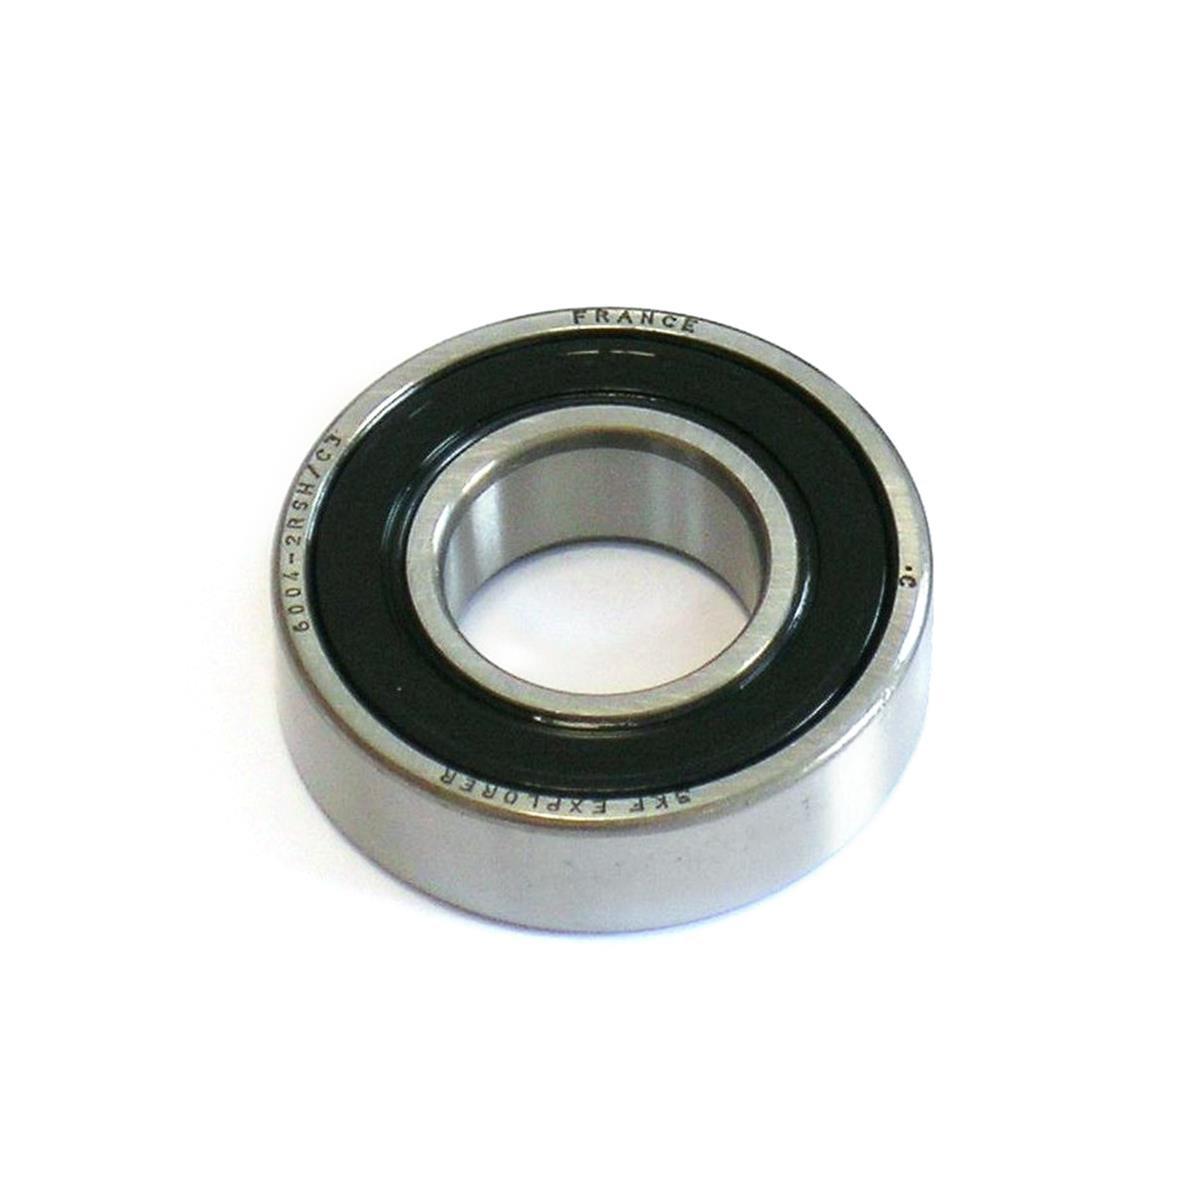 Athena wheel bearing 6005 2rsh c3 skf 47 x 25 x 12 gas gas ec husqvarna cr wr fc fc te tc